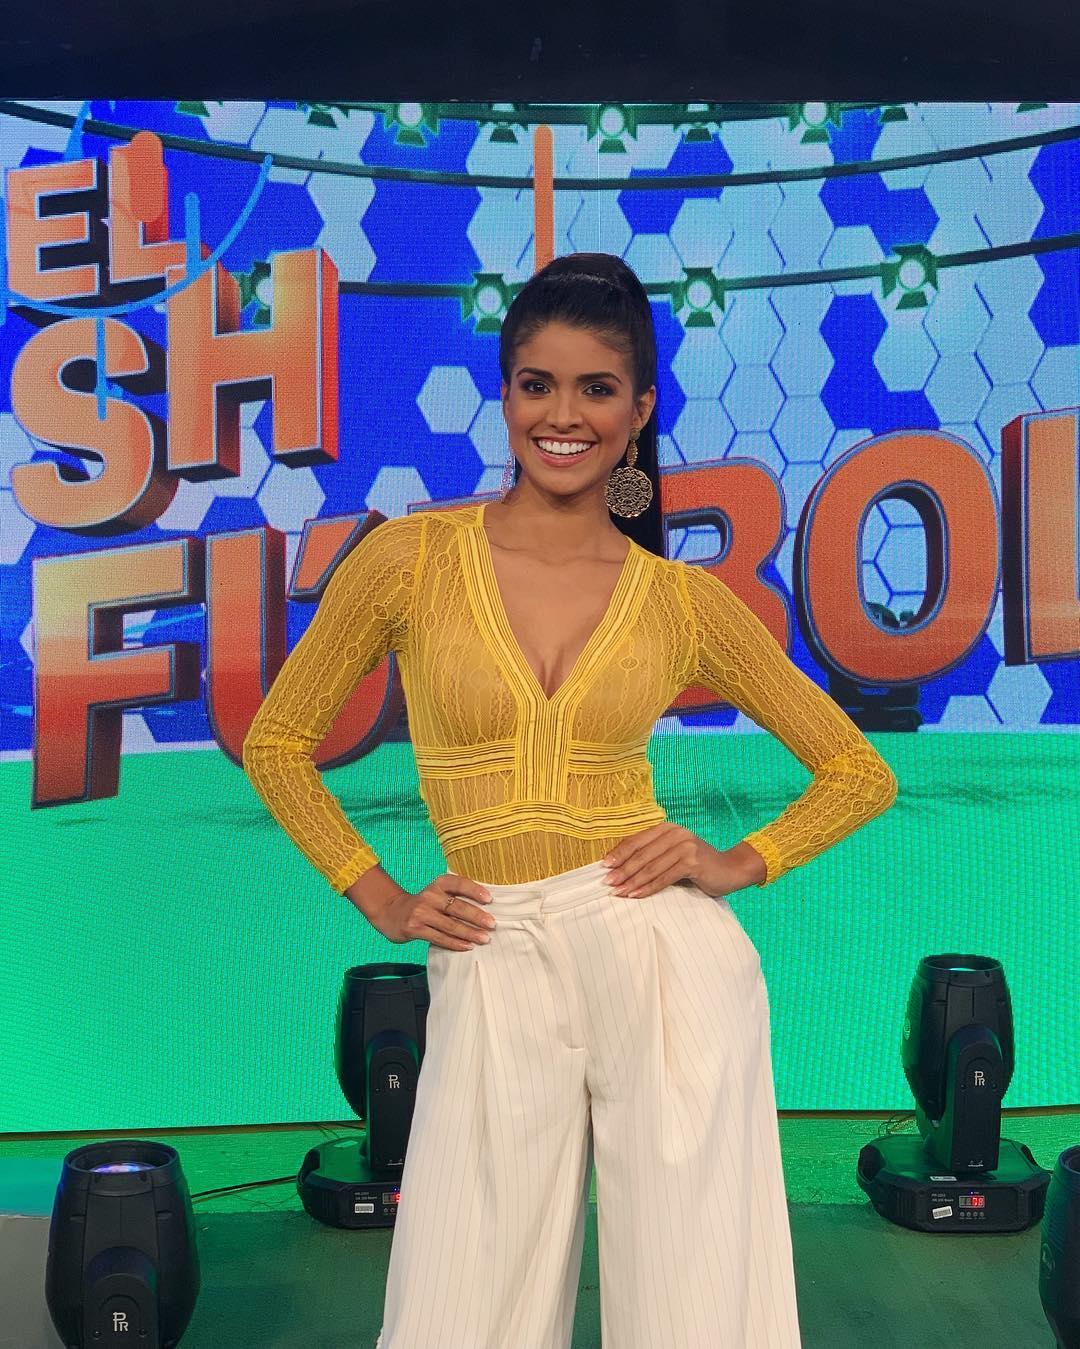 lucia arellano, top 6 de miss peru 2019.  - Página 2 43258311